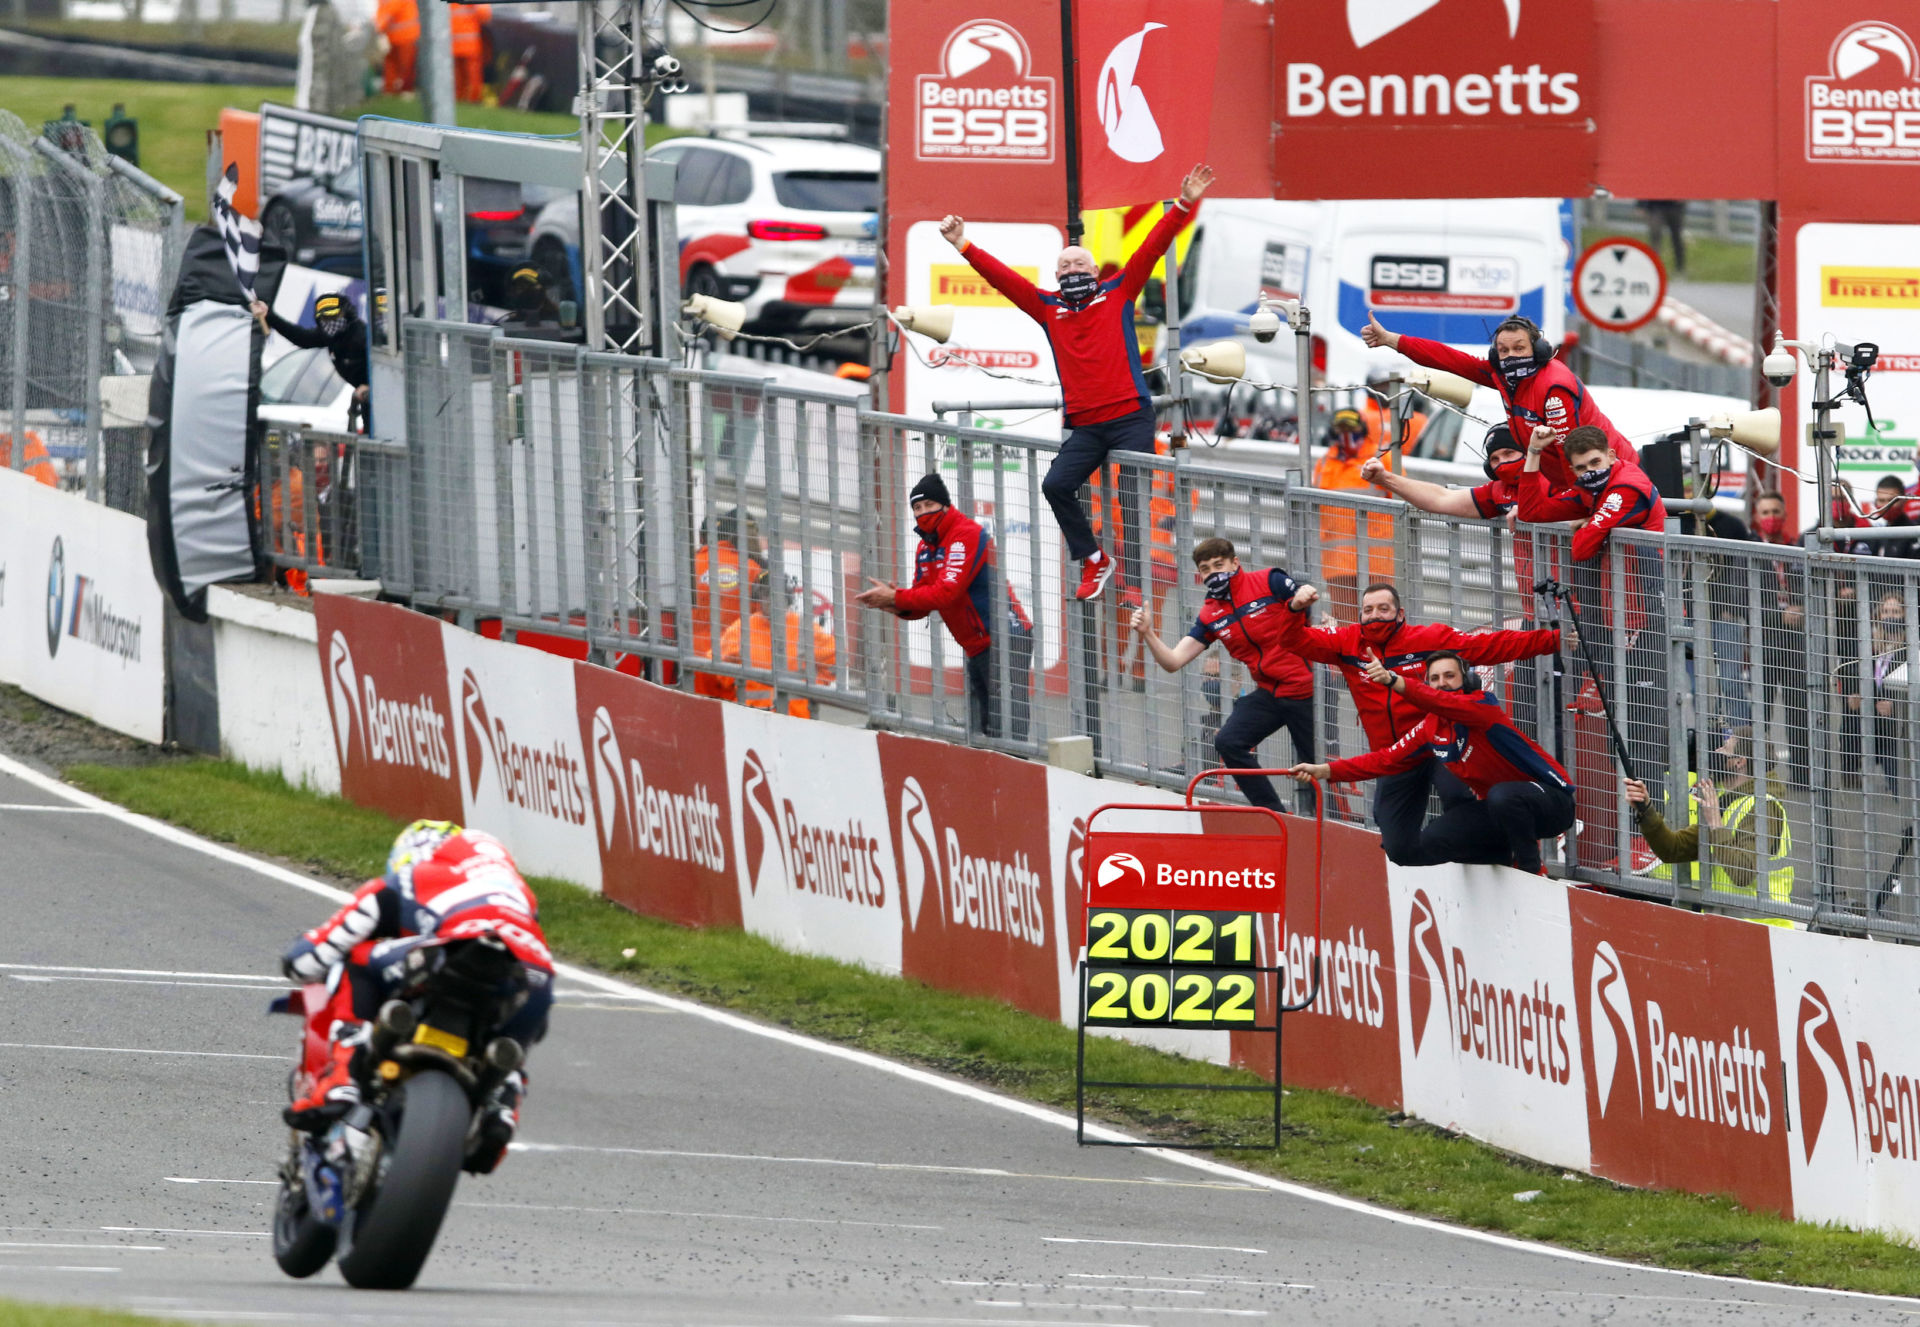 Edited image courtesy MotorSport Vision Racing.